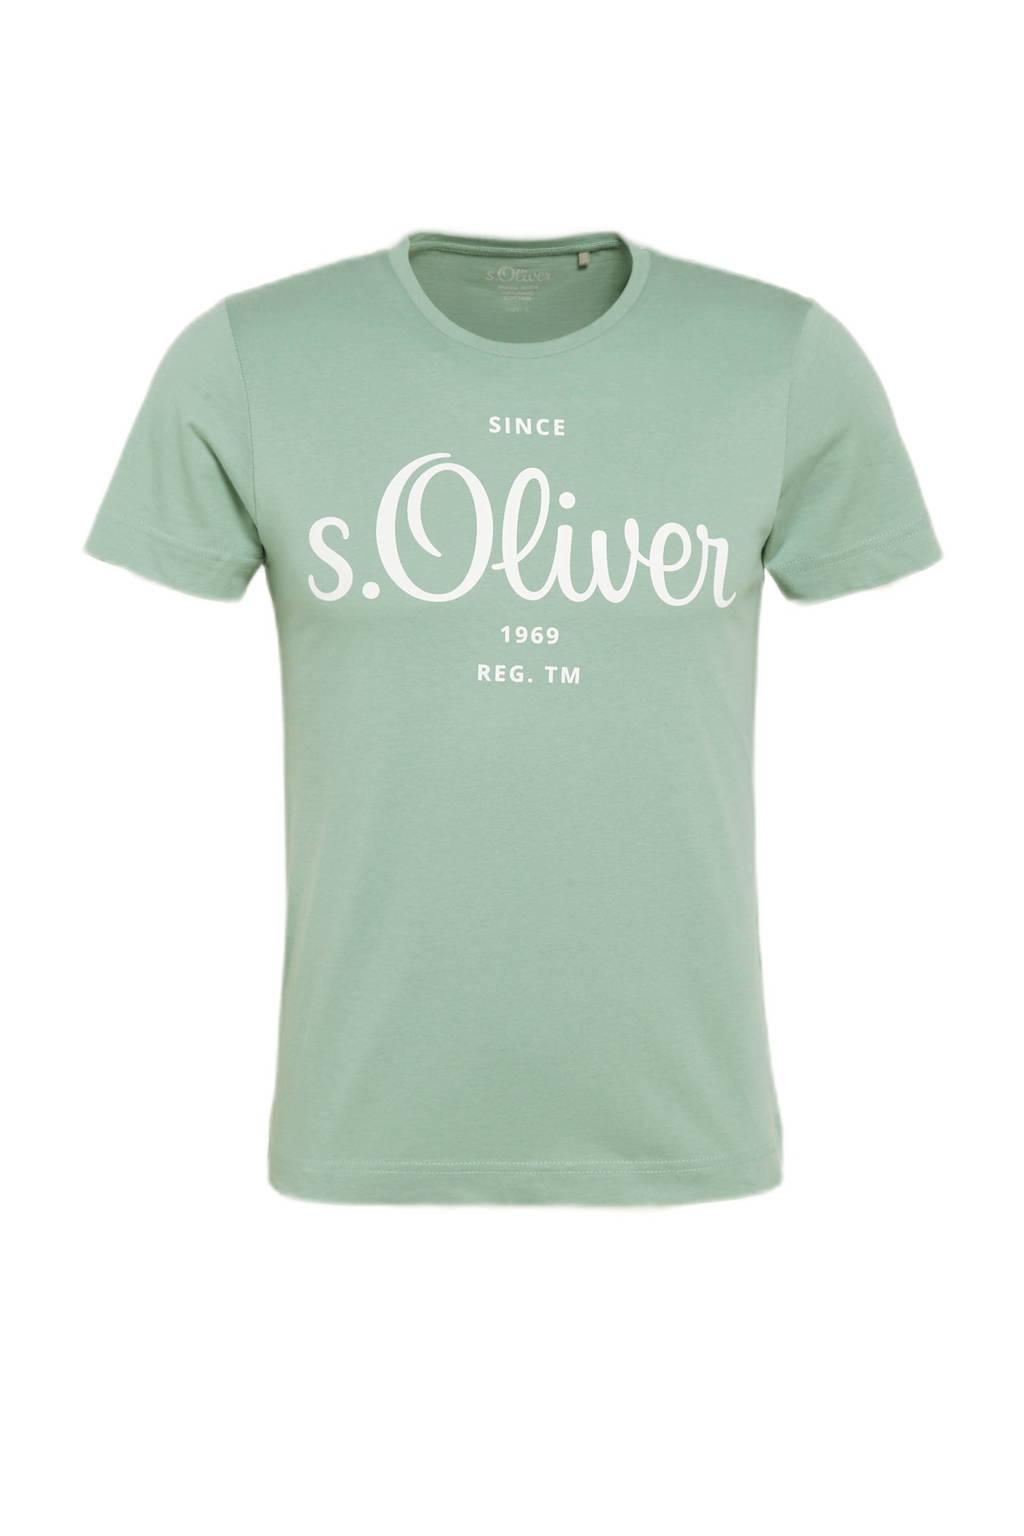 s.Oliver regular fit T-shirt met logo lichtgroen, Lichtgroen